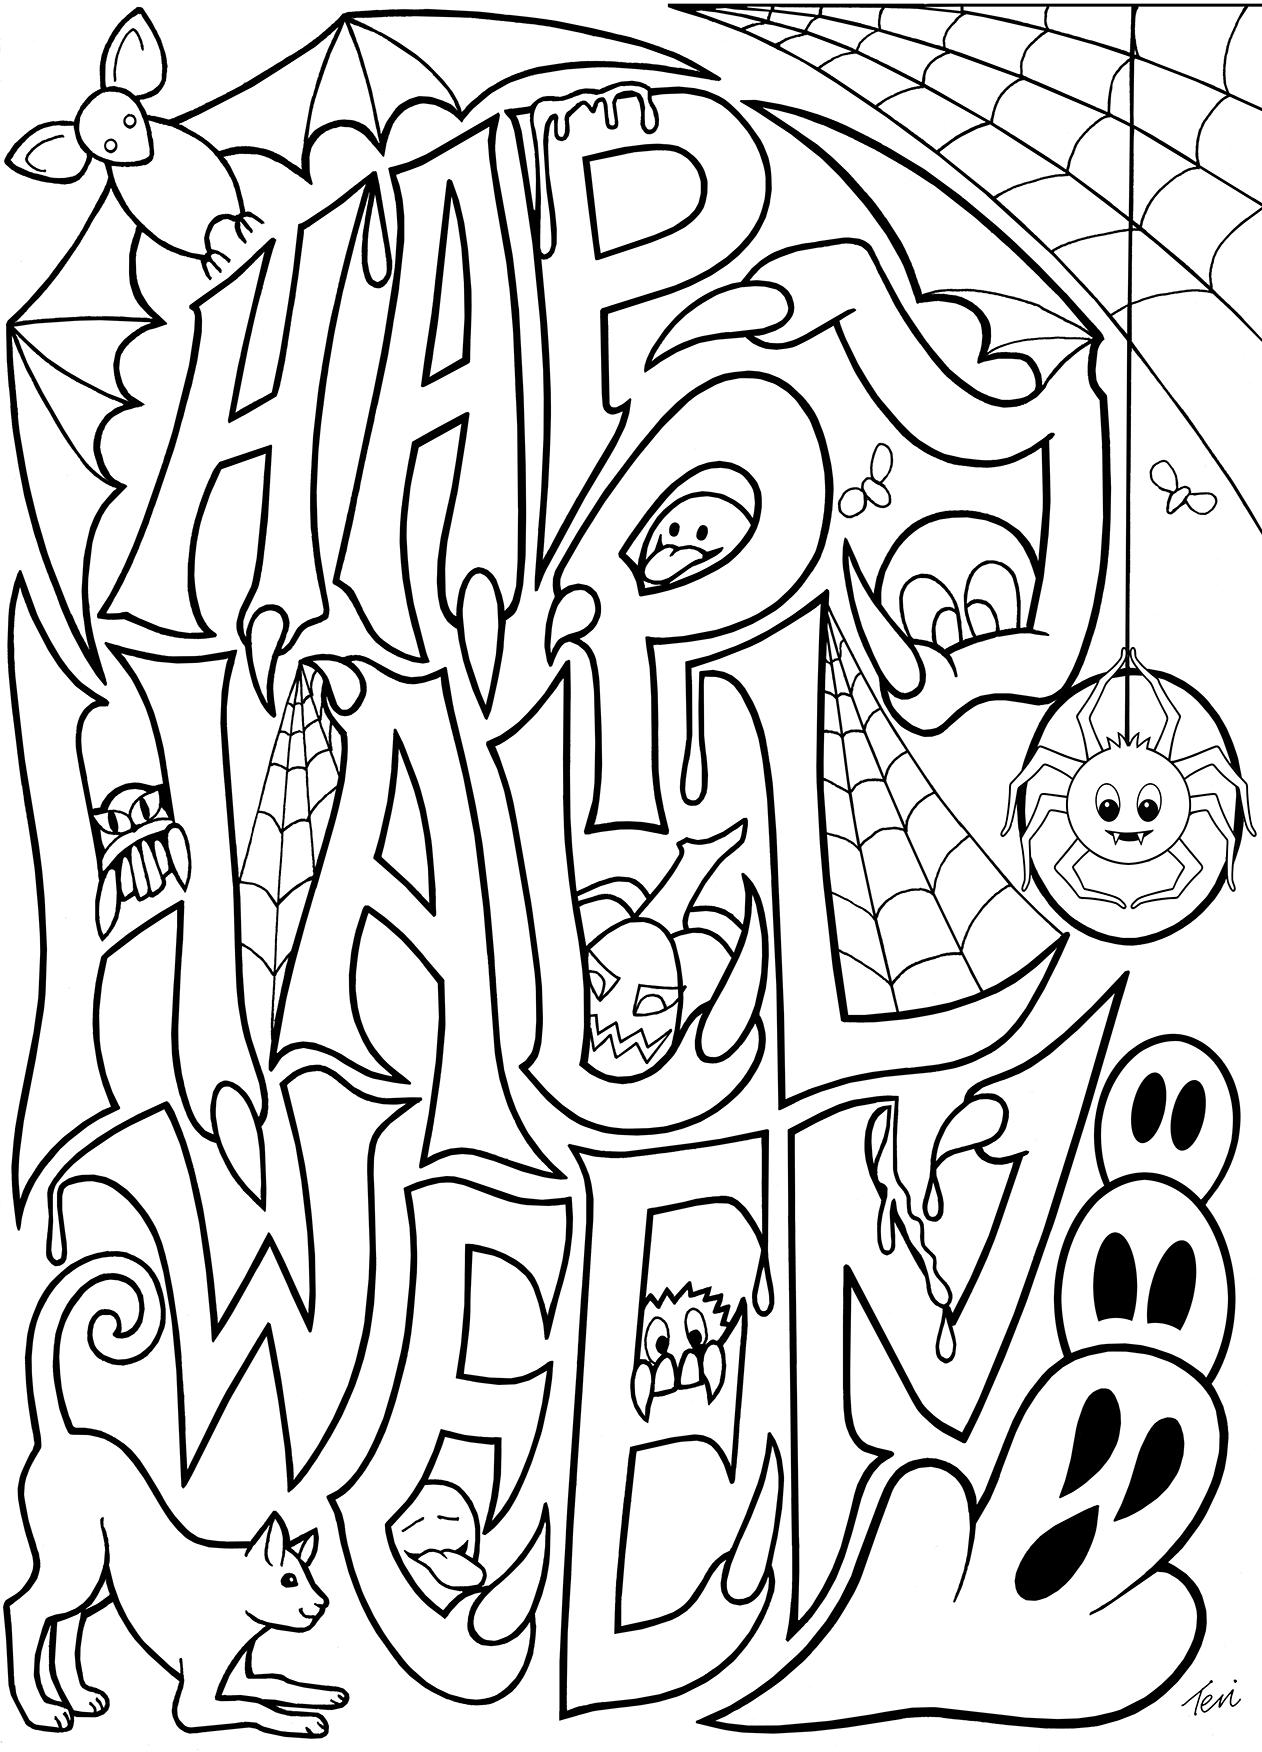 Malvorlagen Happy Halloween – tiffanylovesbooks.com